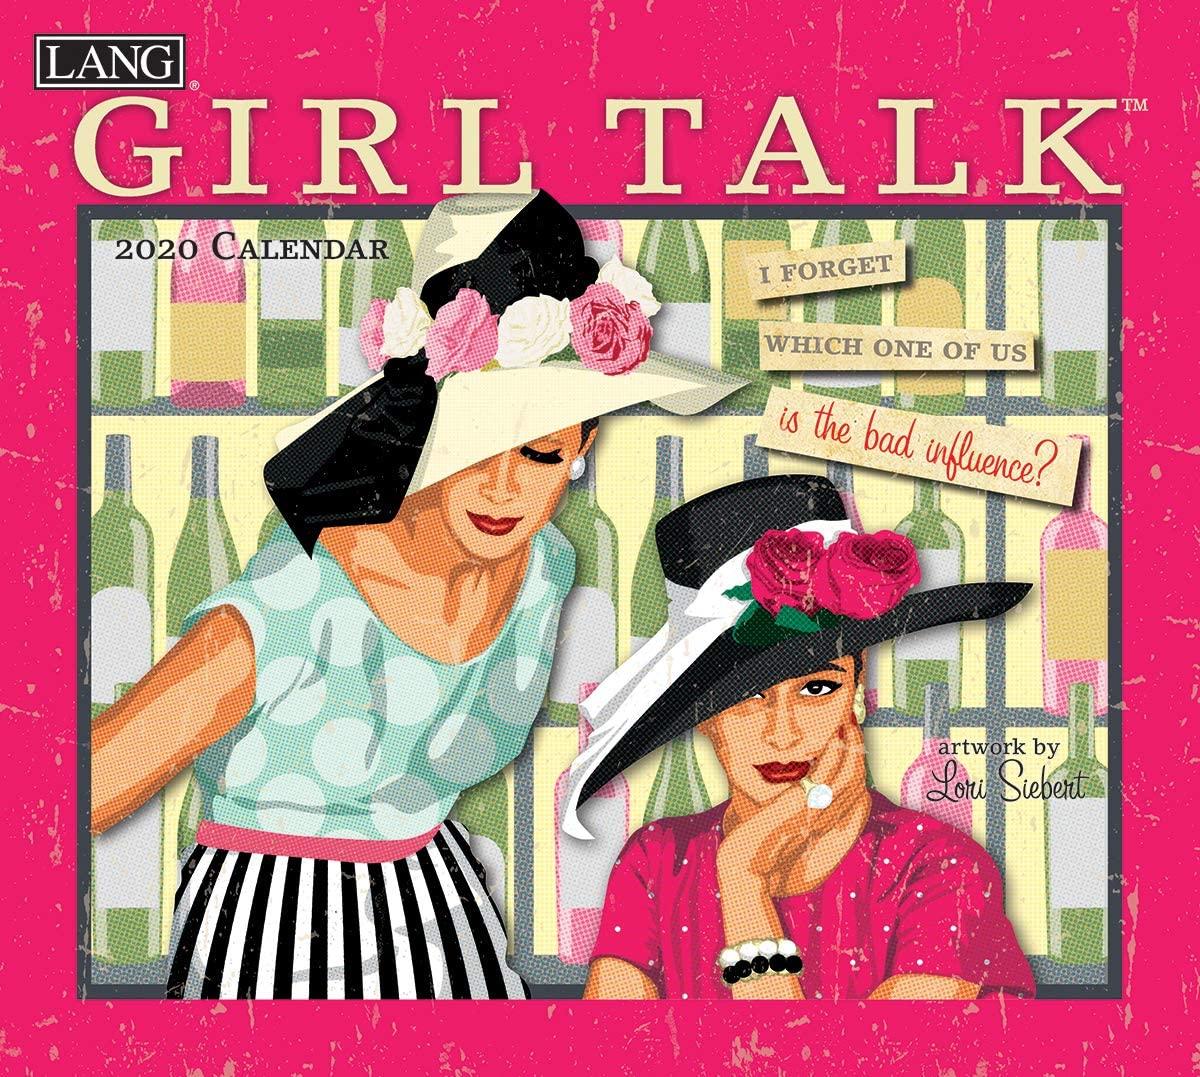 Lang Girl Talk 2020 Wall Calendar (20991001997)